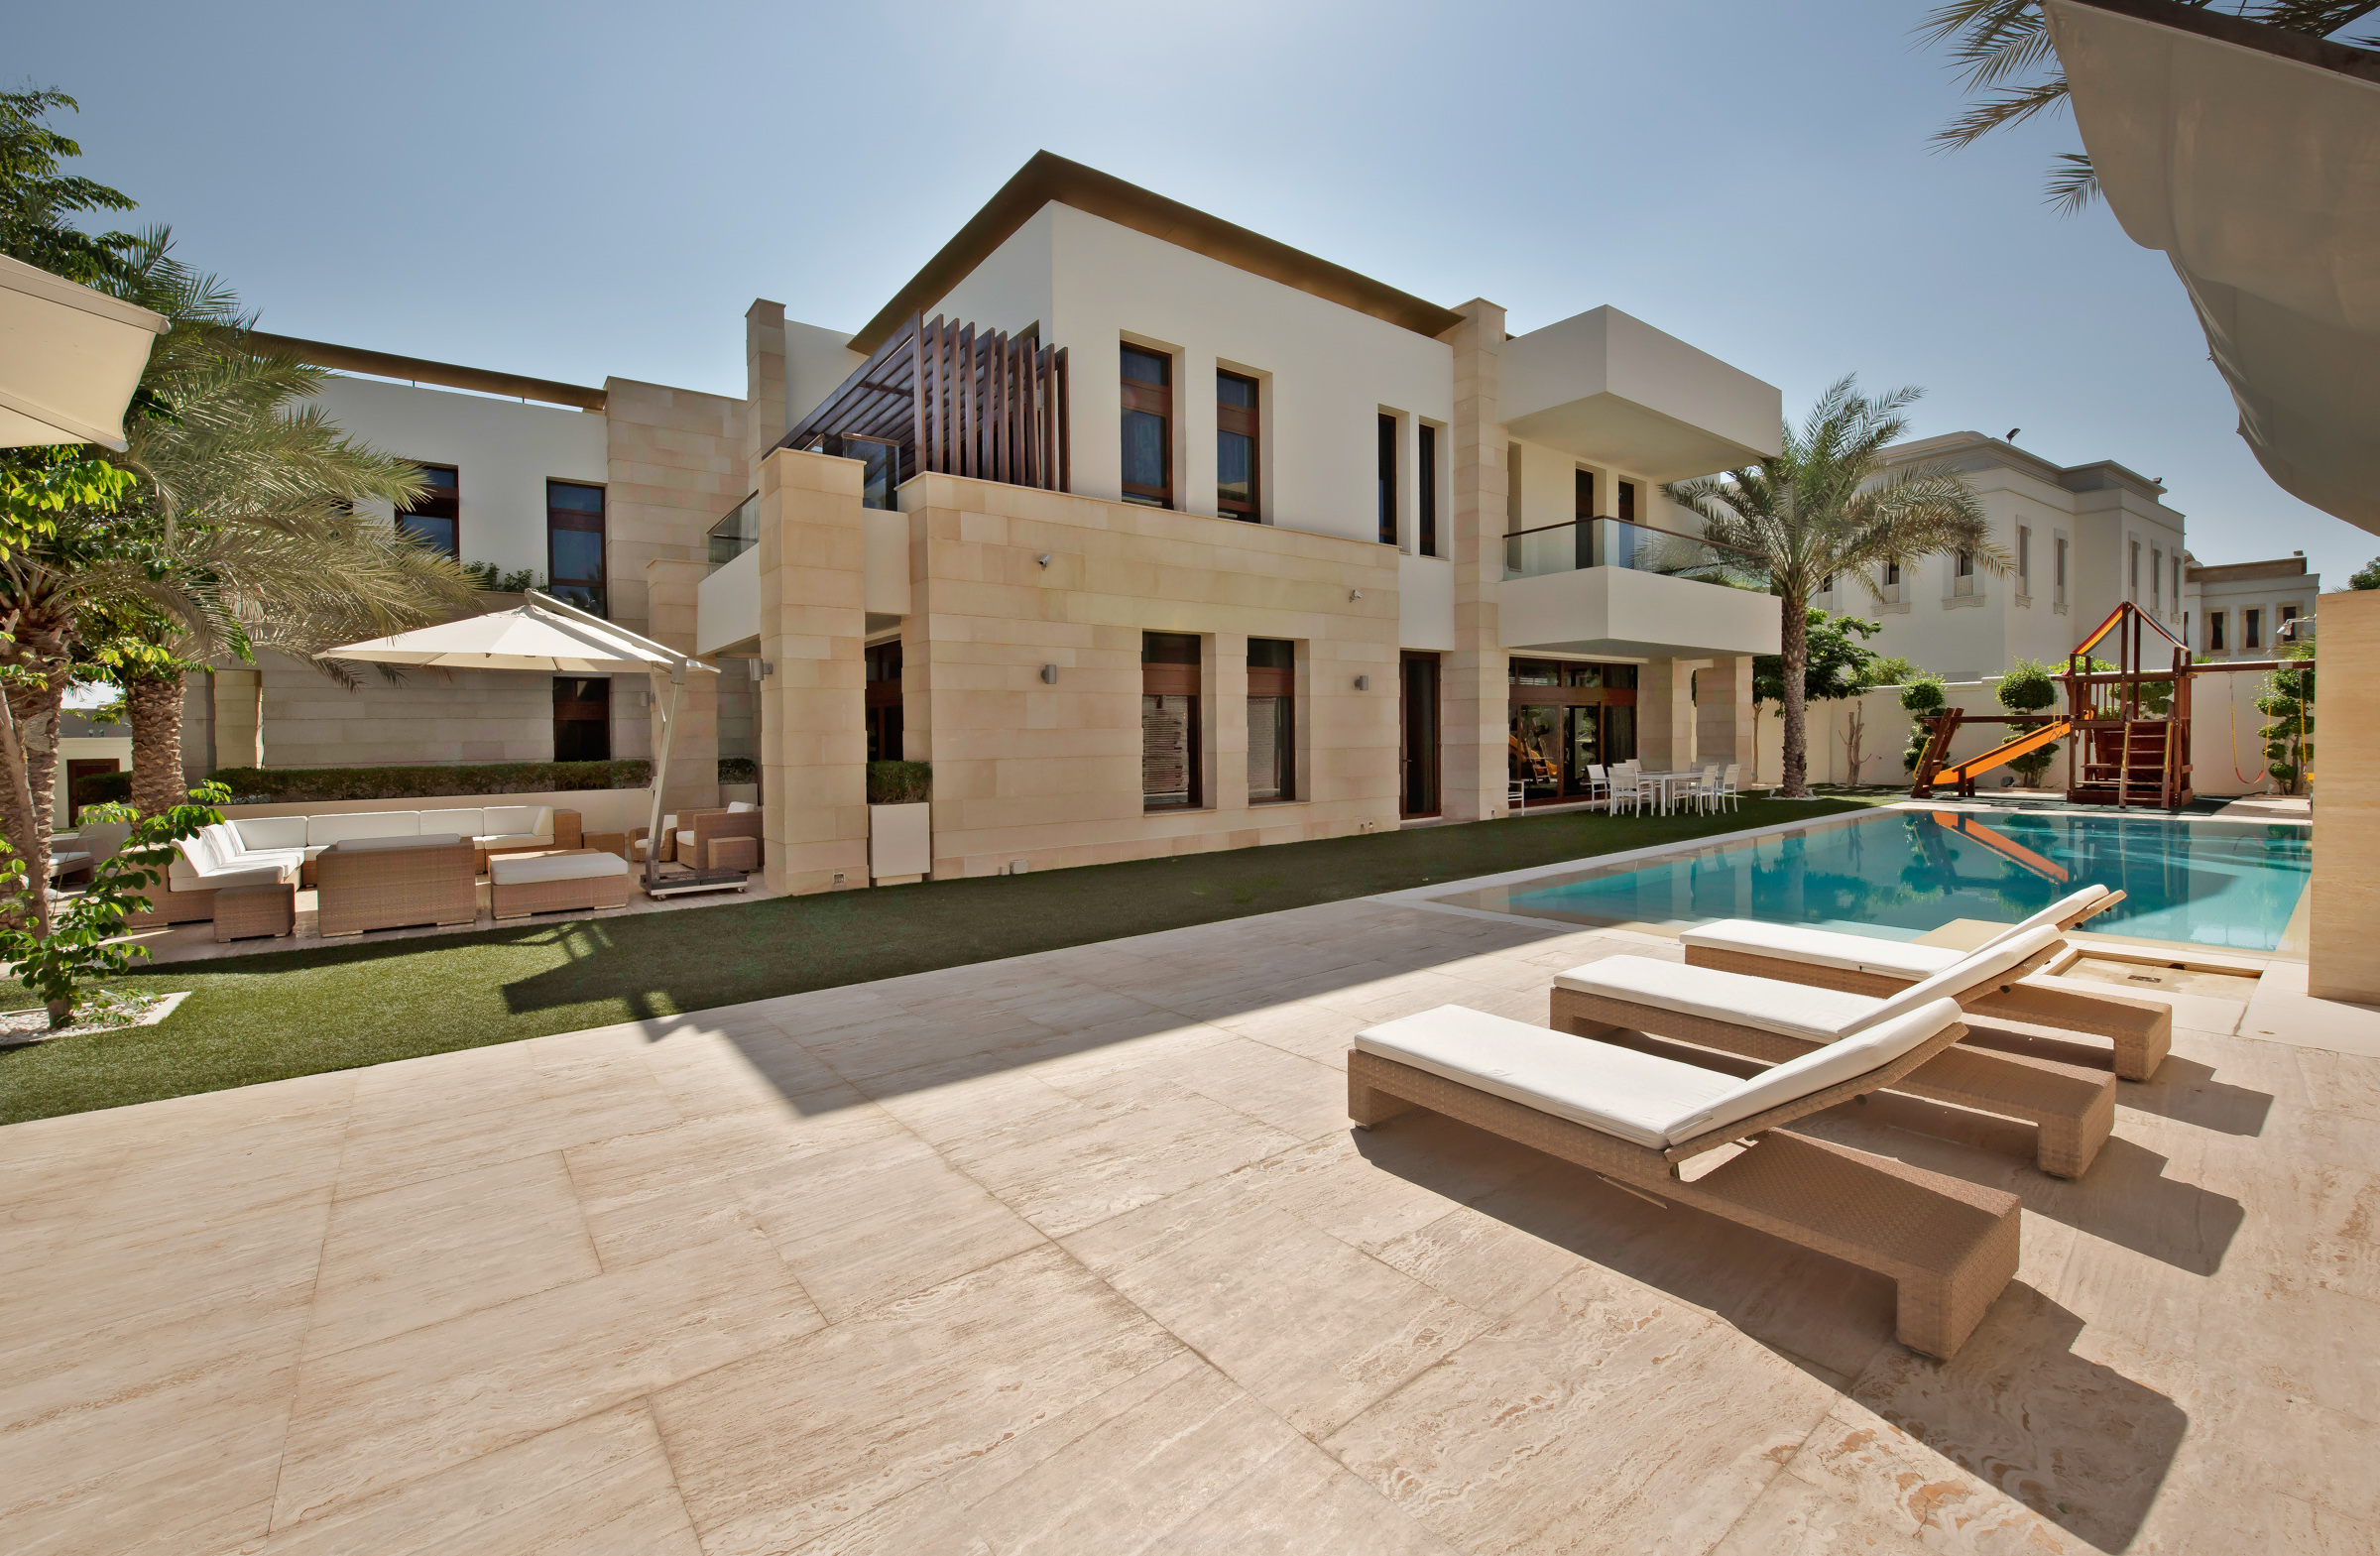 Multi-Family Home for Sale at Modern Lake View Emirates Hills Villa Emirates Hills, Dubai, United Arab Emirates